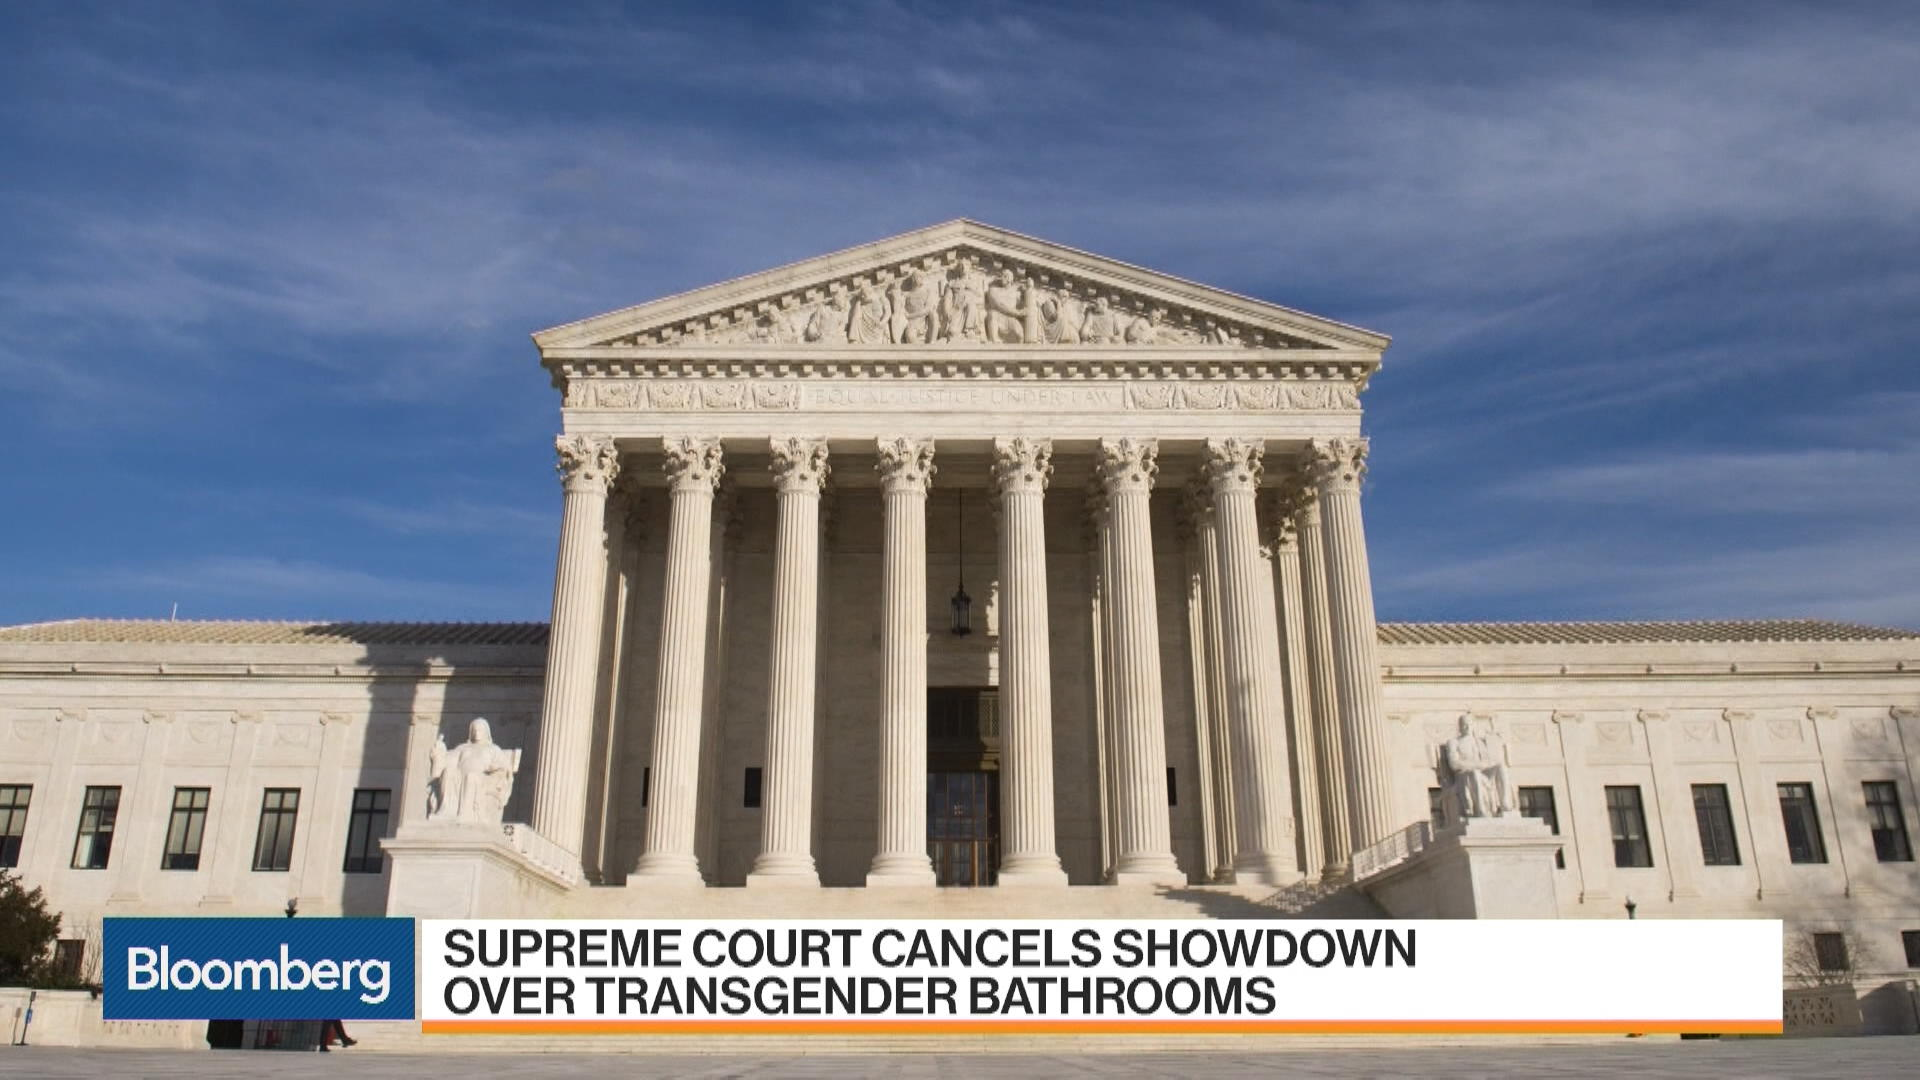 U.S. Supreme Court Cancels Transgender Bathroom Showdown